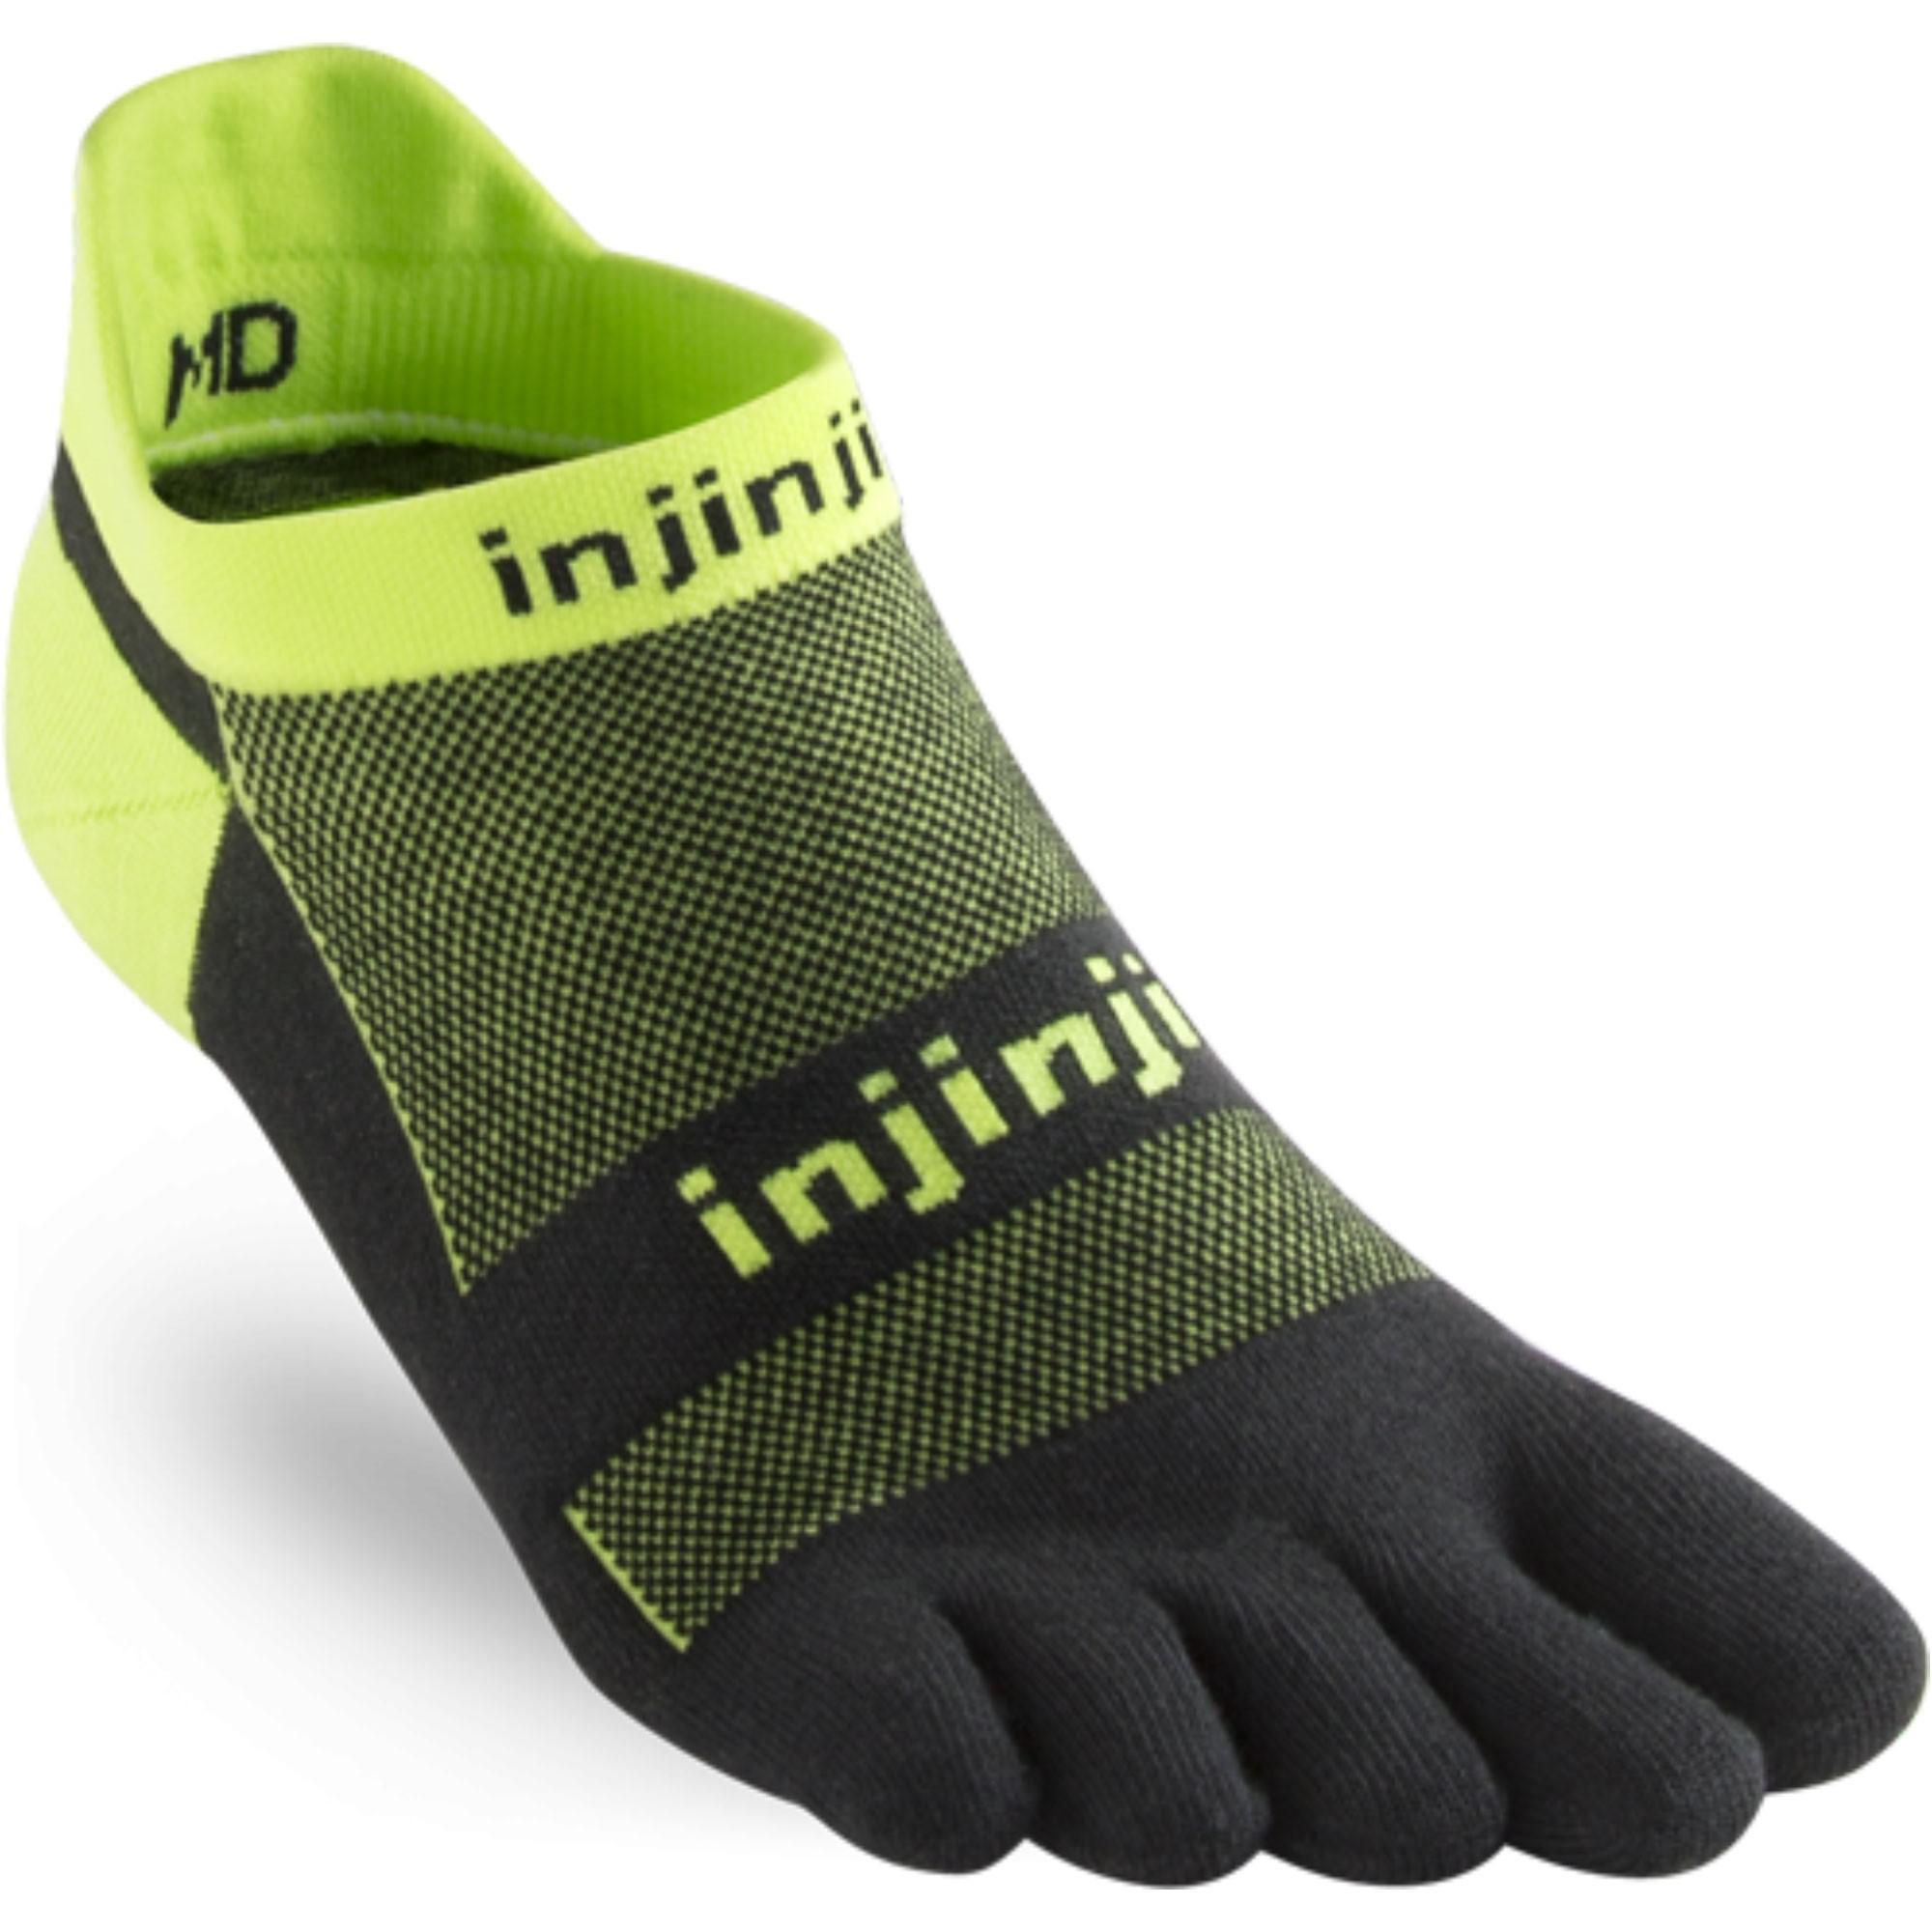 INJINJI Run Light Weight No Show Toe Socks - Grasshopper